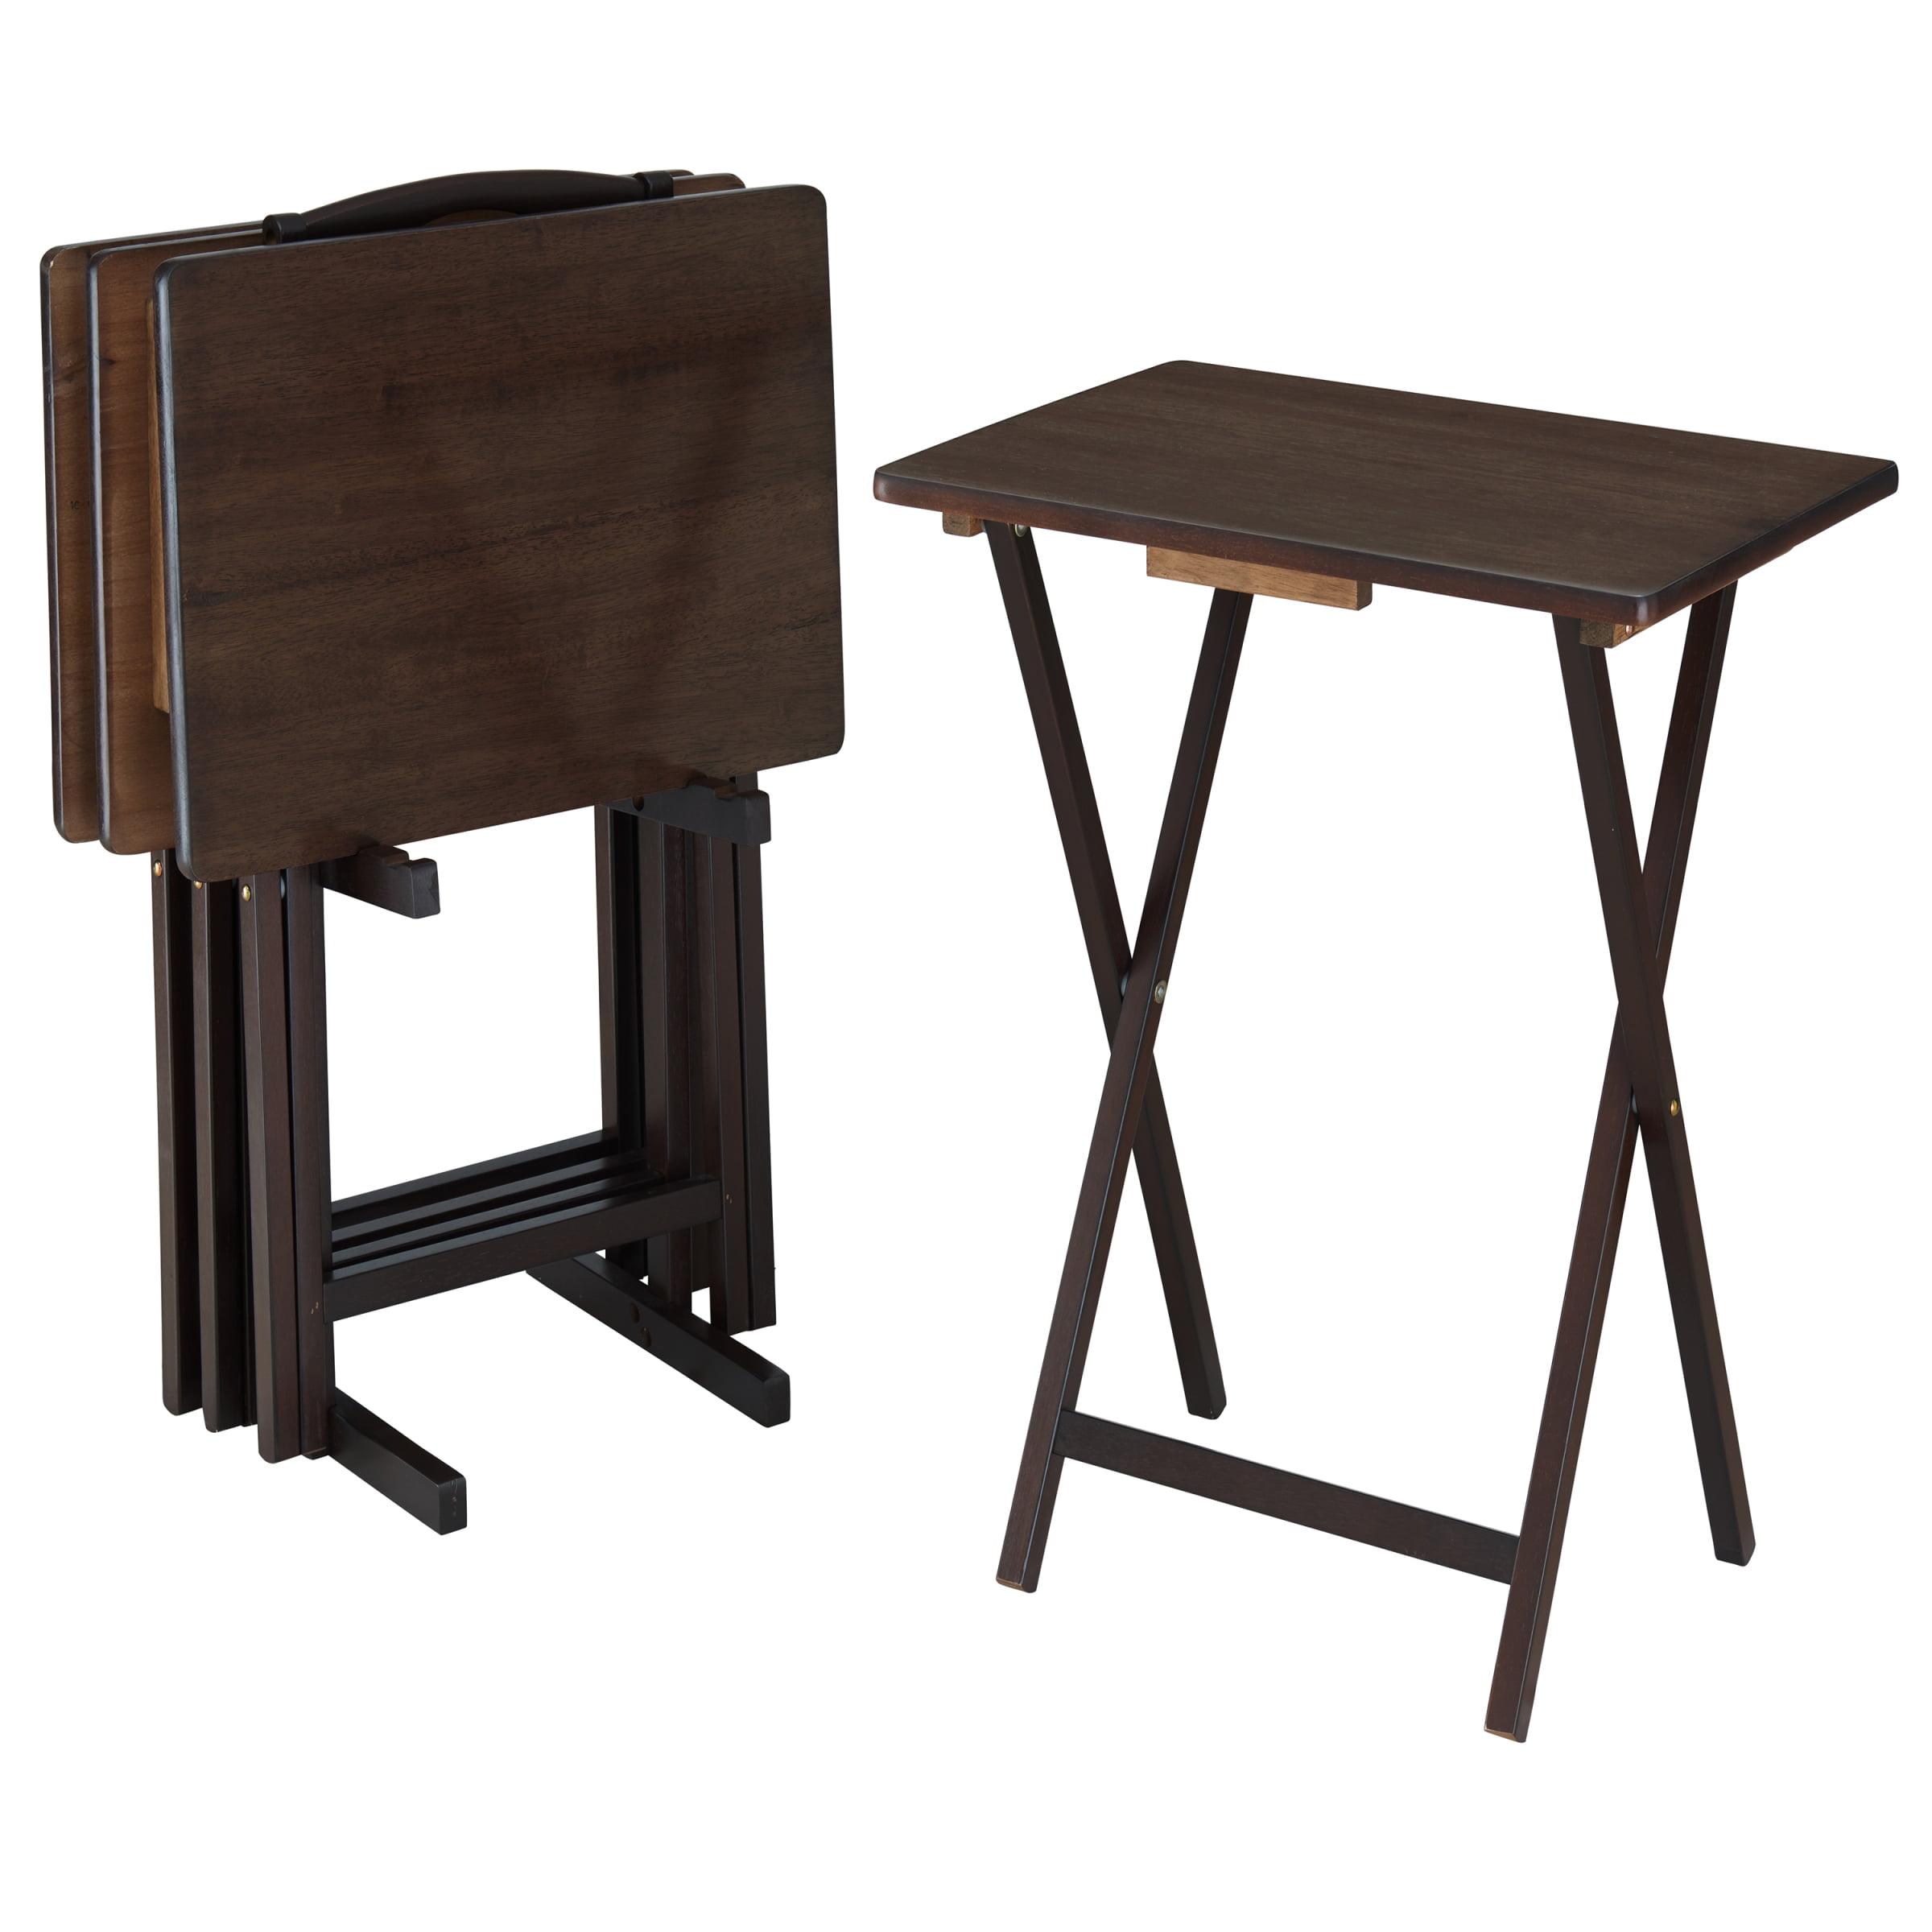 Mainstays 5-Piece Folding Tray Table Set in Walnut